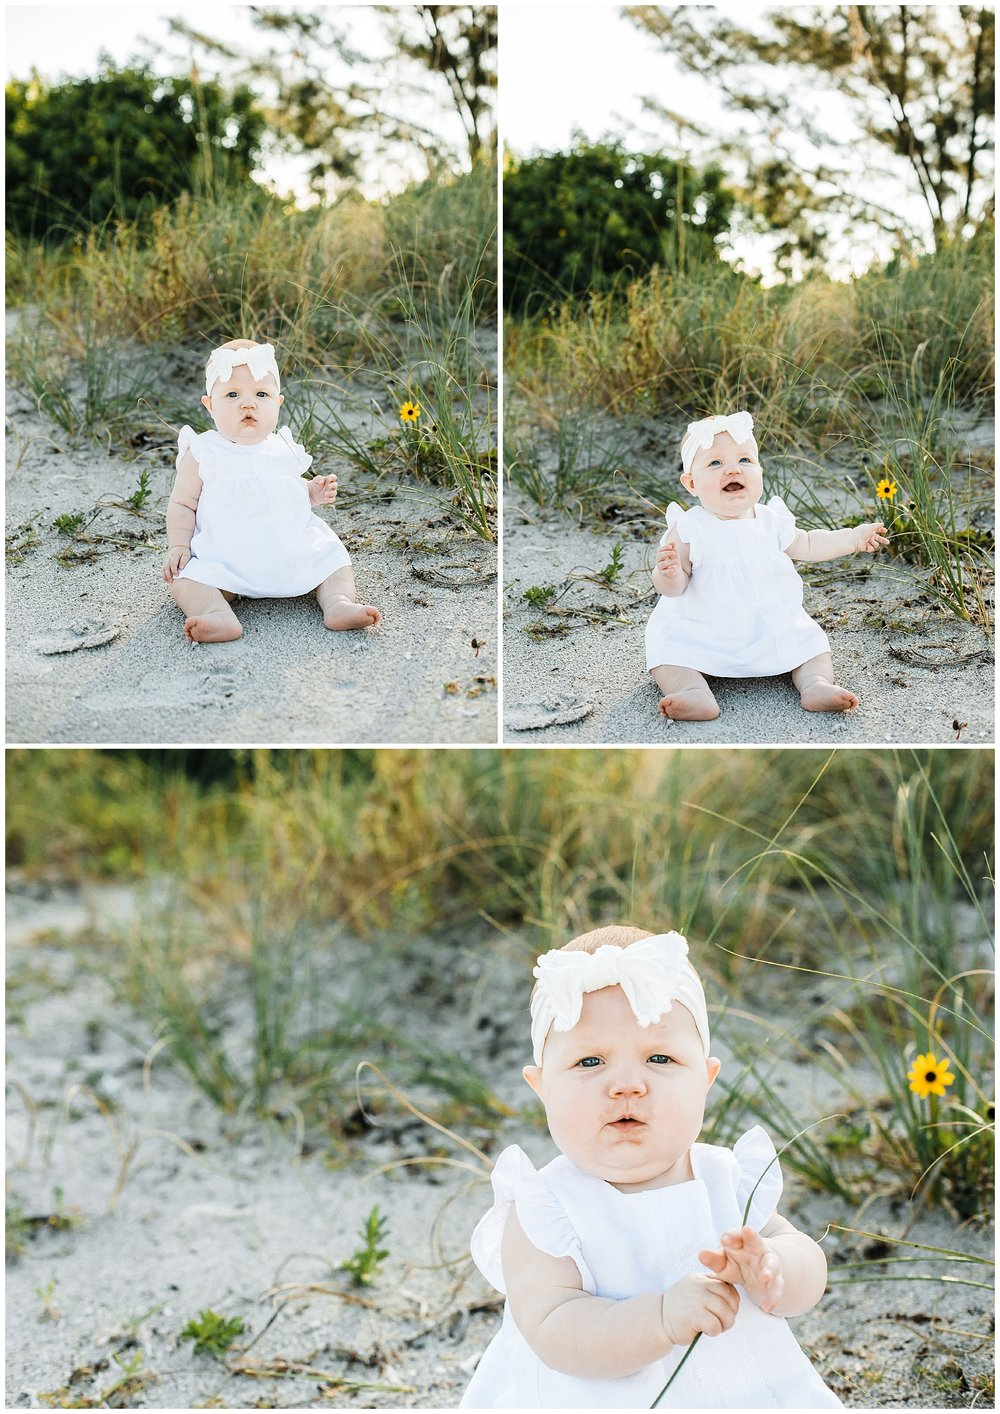 jessicafredericks_photography_family_beach_baby_clearwater_st pete beach_0018.jpg